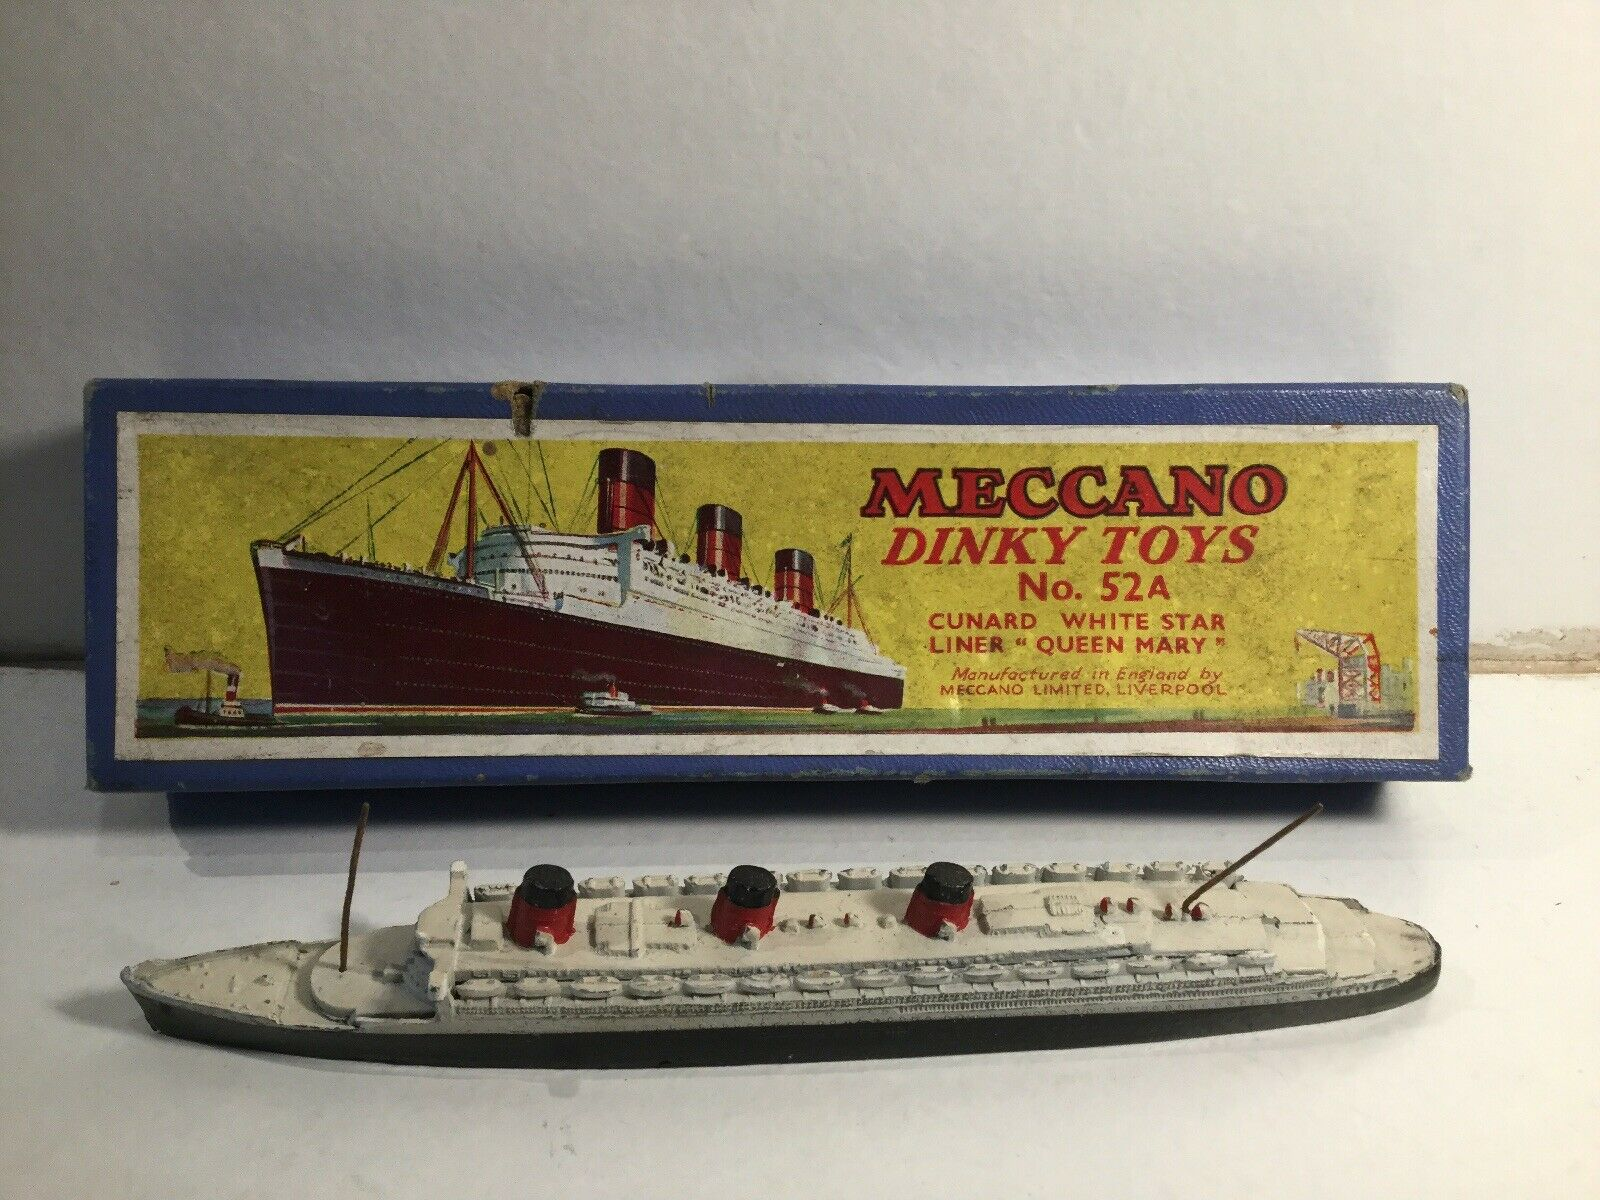 Meccano Dinky Ships 52 A Cunard blanc Star Liner Queen Mary dans sa boîte d'origine